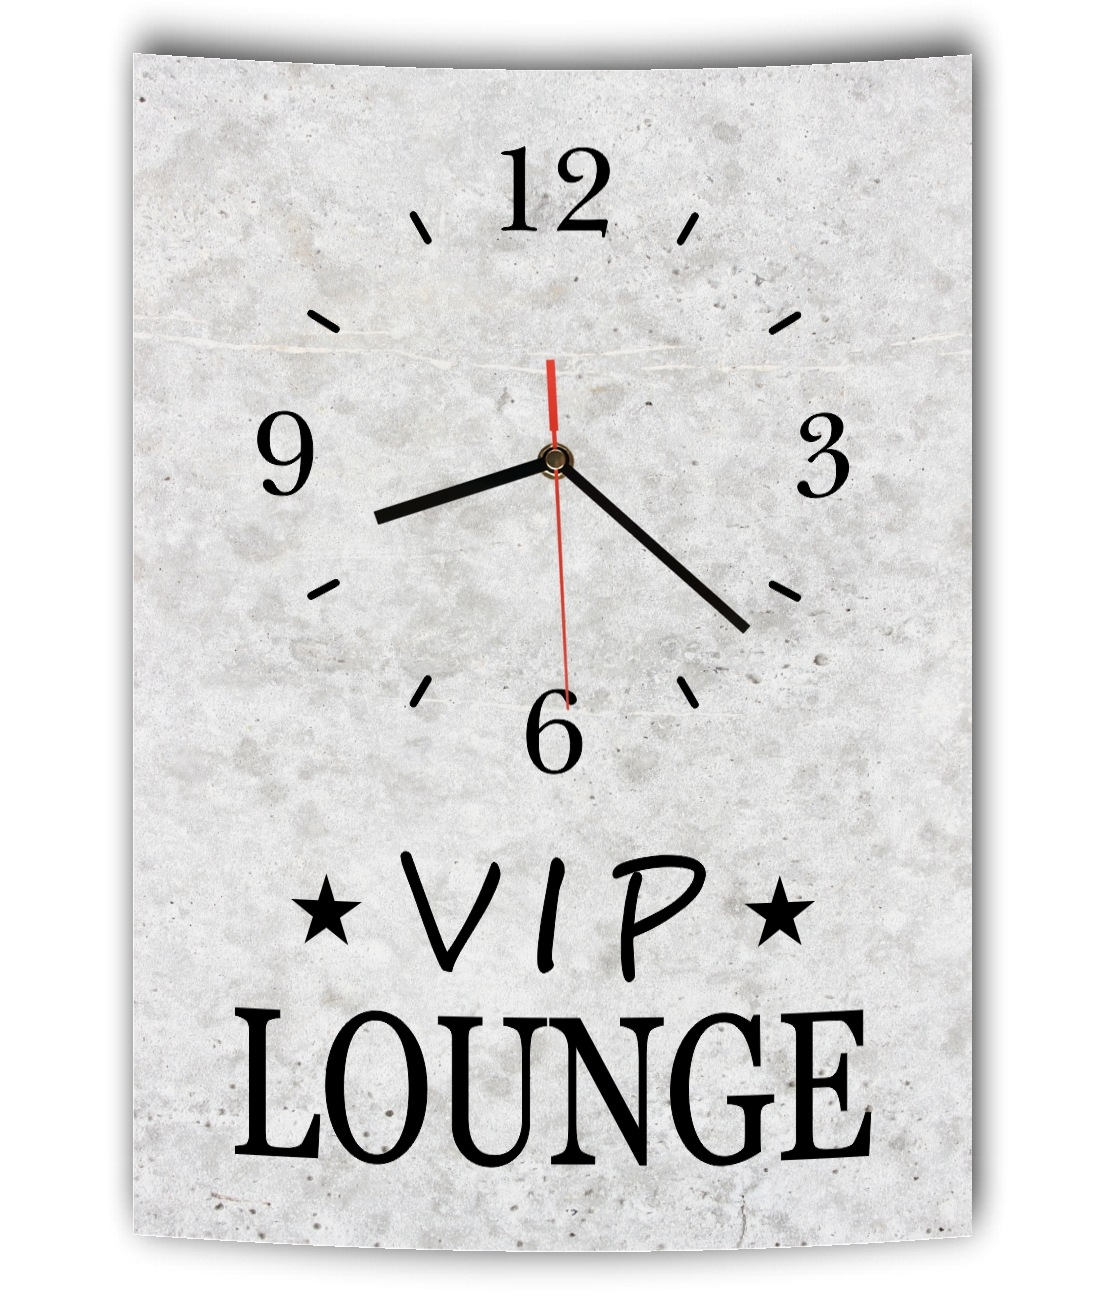 lautlose designer wanduhr mit spruch vip lounge grau betonoptik